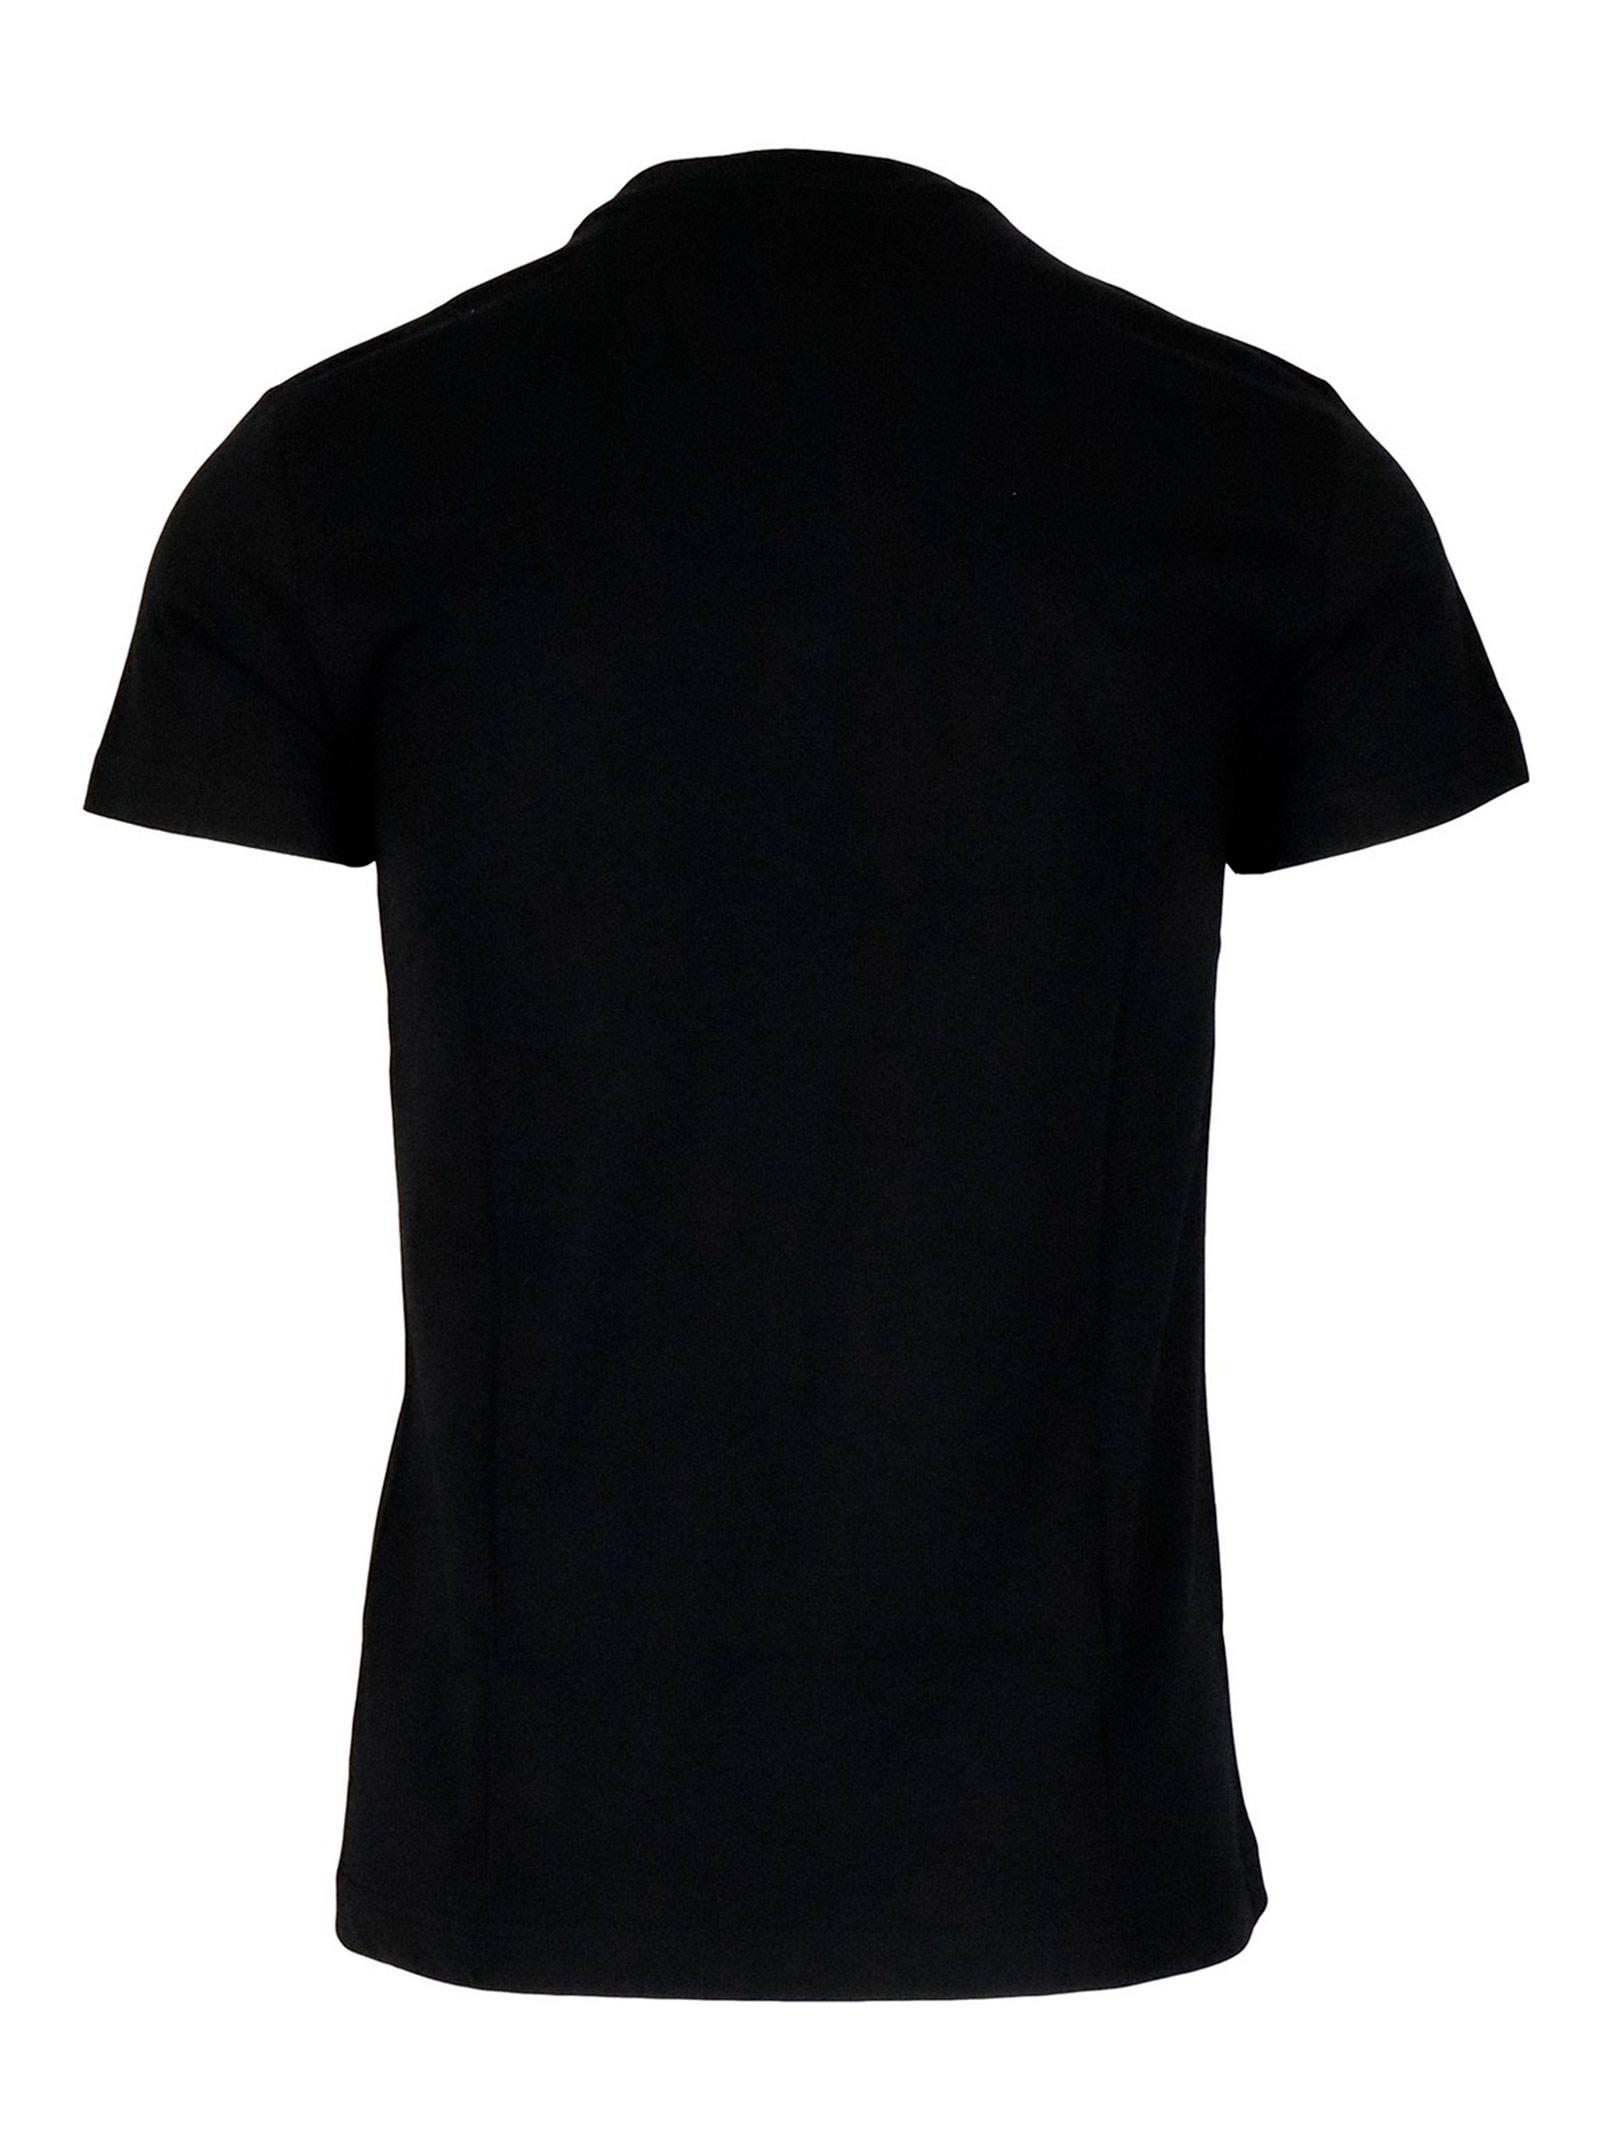 T-shirt Maniche Corte VERSACE JEANS | T-shirt | B3 GWA7TB30319 K42